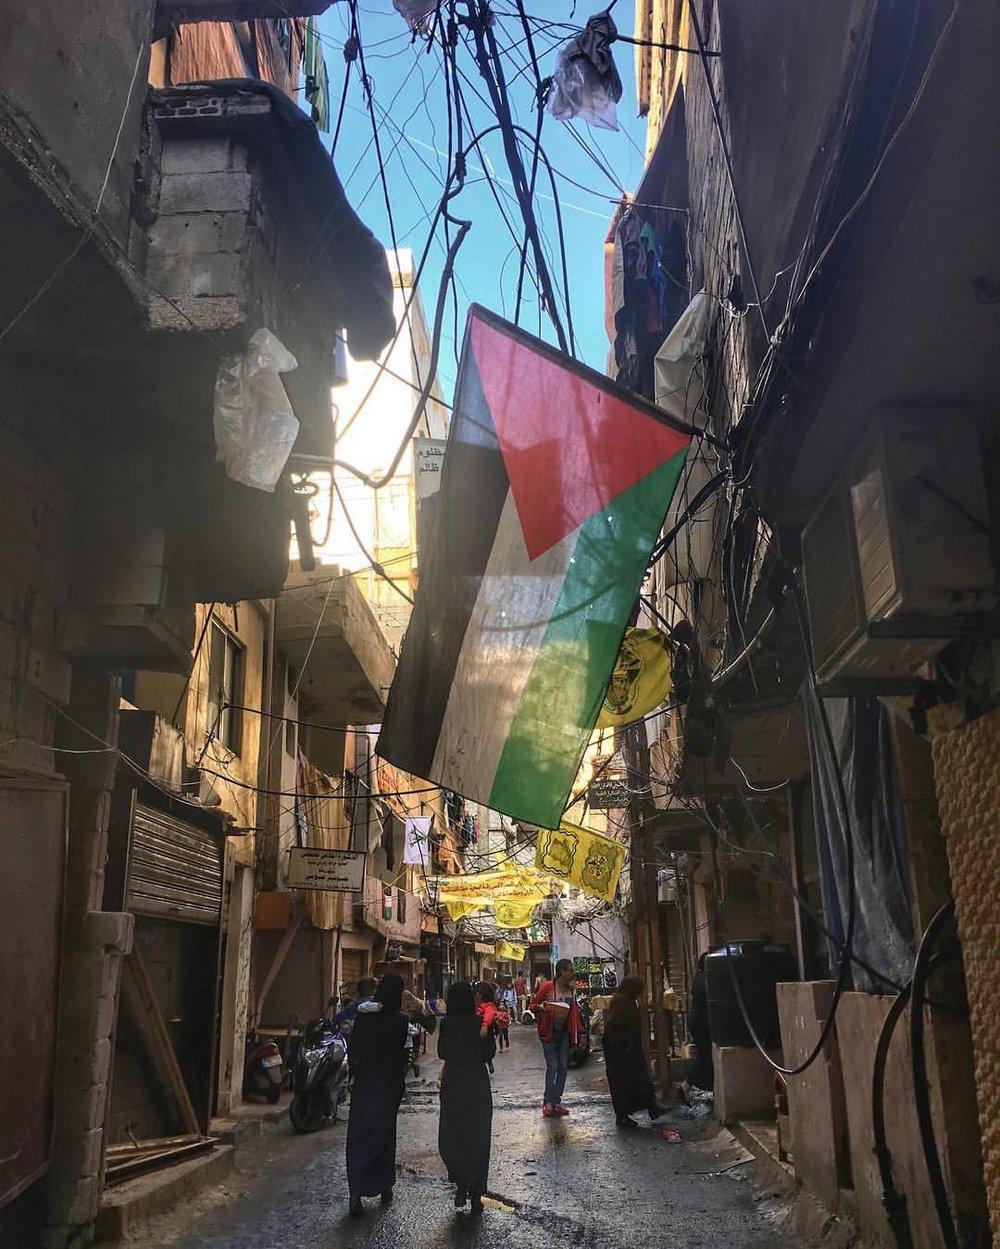 Shatila Palestinian Refugee Camp in Beirut, Lebanon